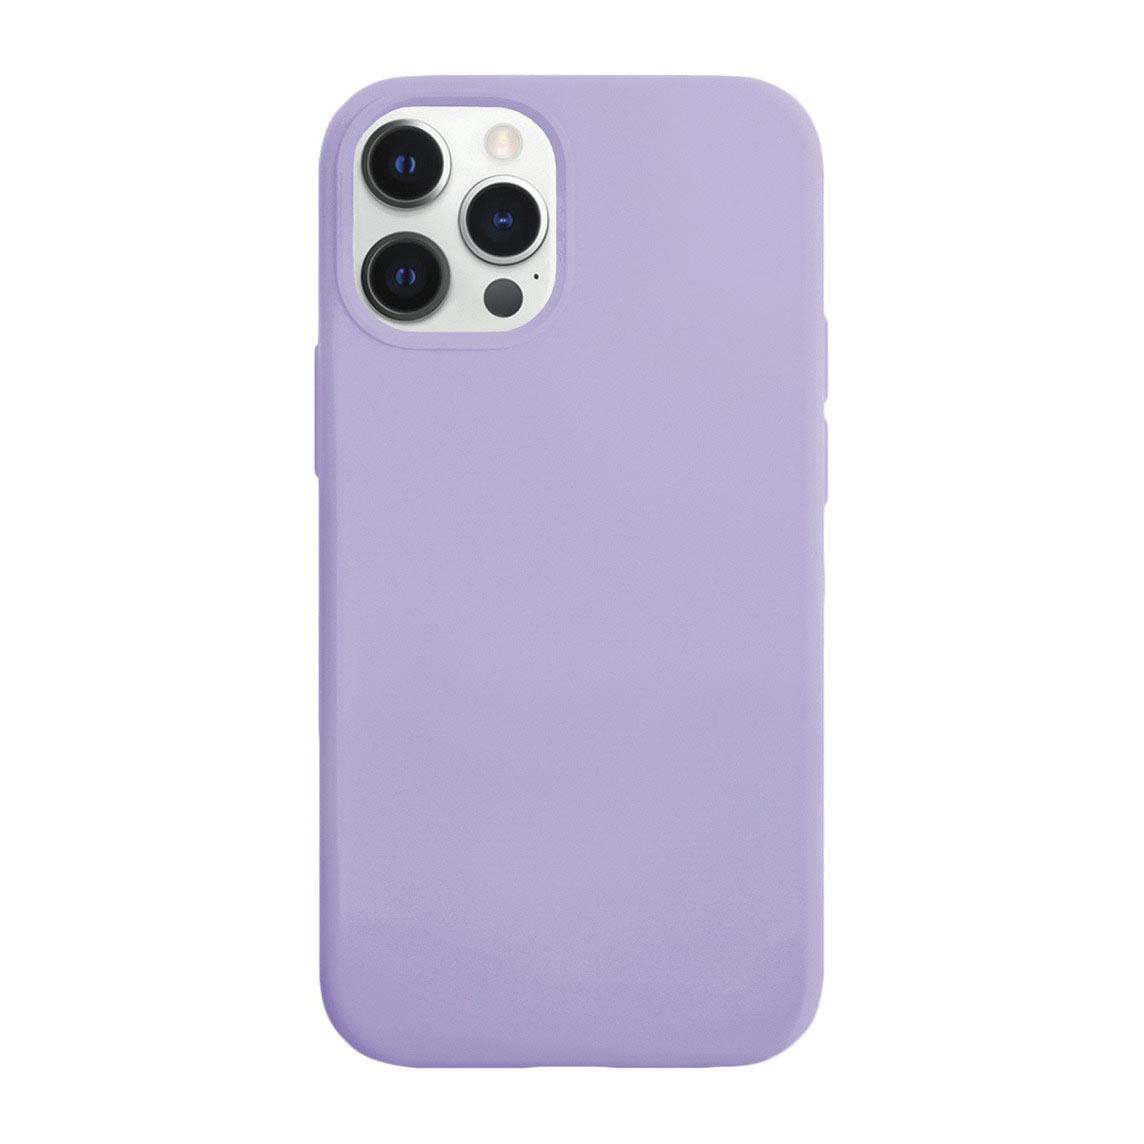 Чехол VLP Silicone Case для смартфона Apple iPhone 12/12 Pro, фиолетовый